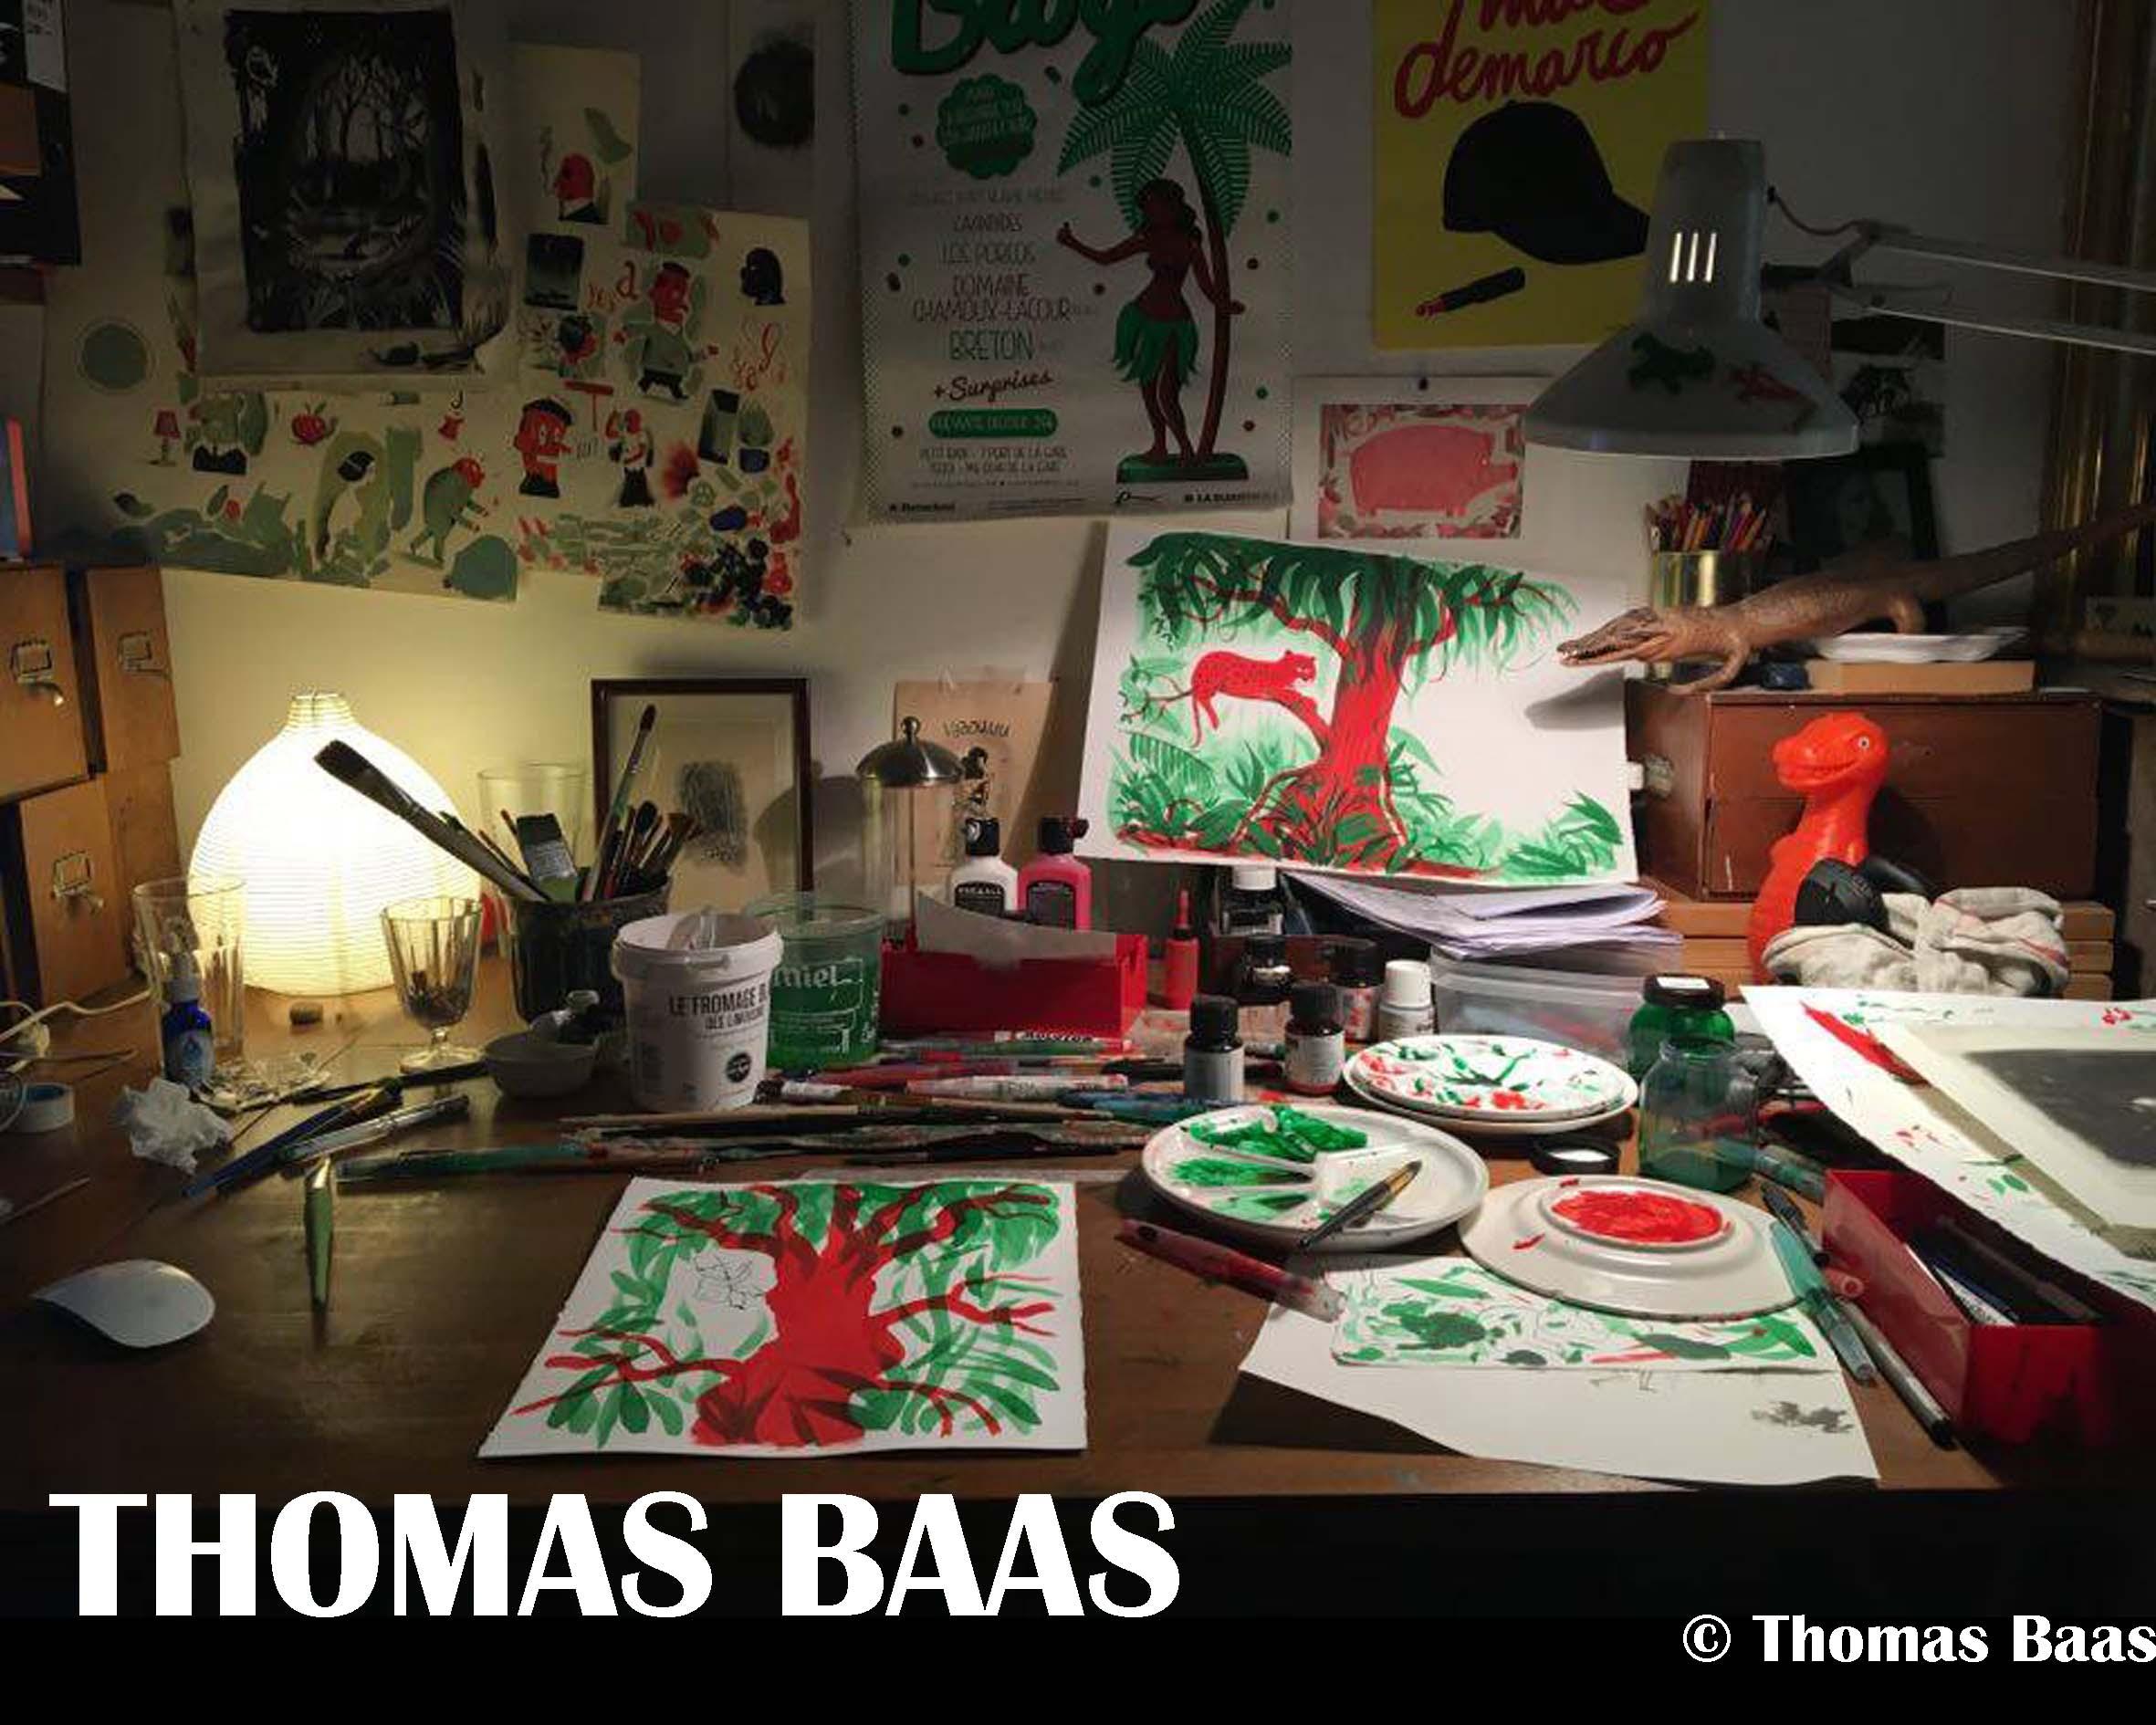 Thomas Baas